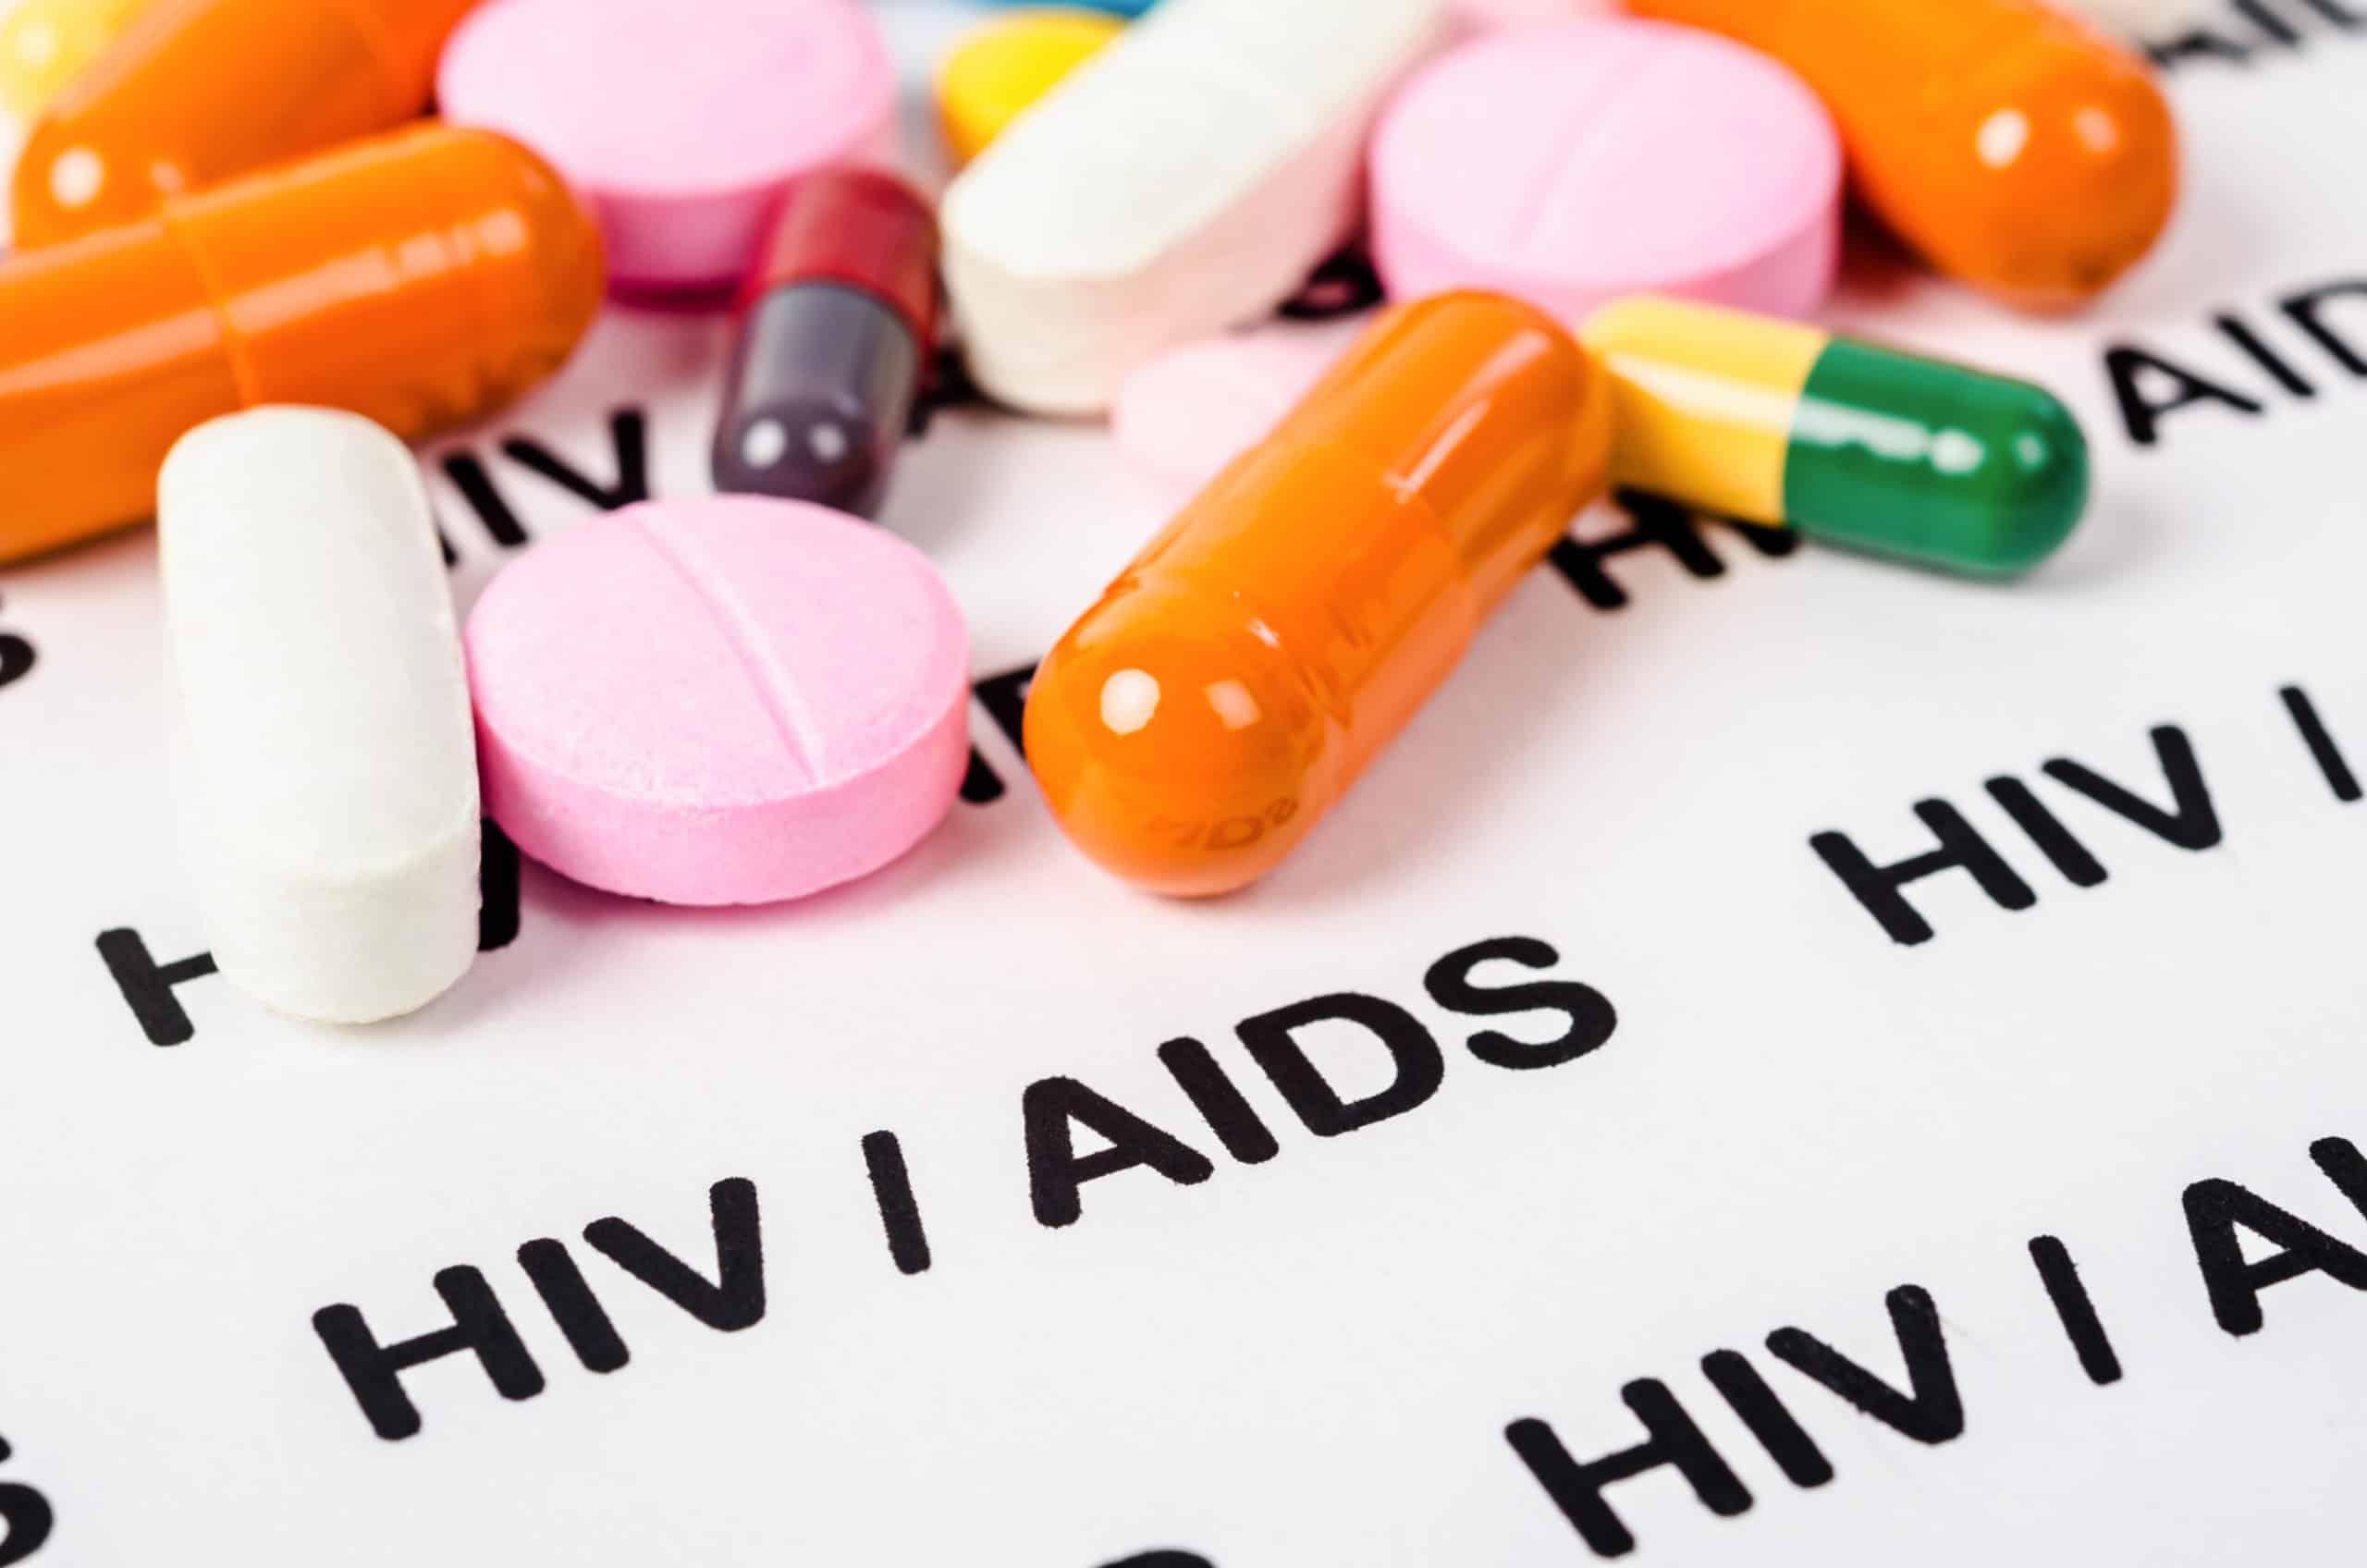 hiv-aids-pills-dec-7-2020